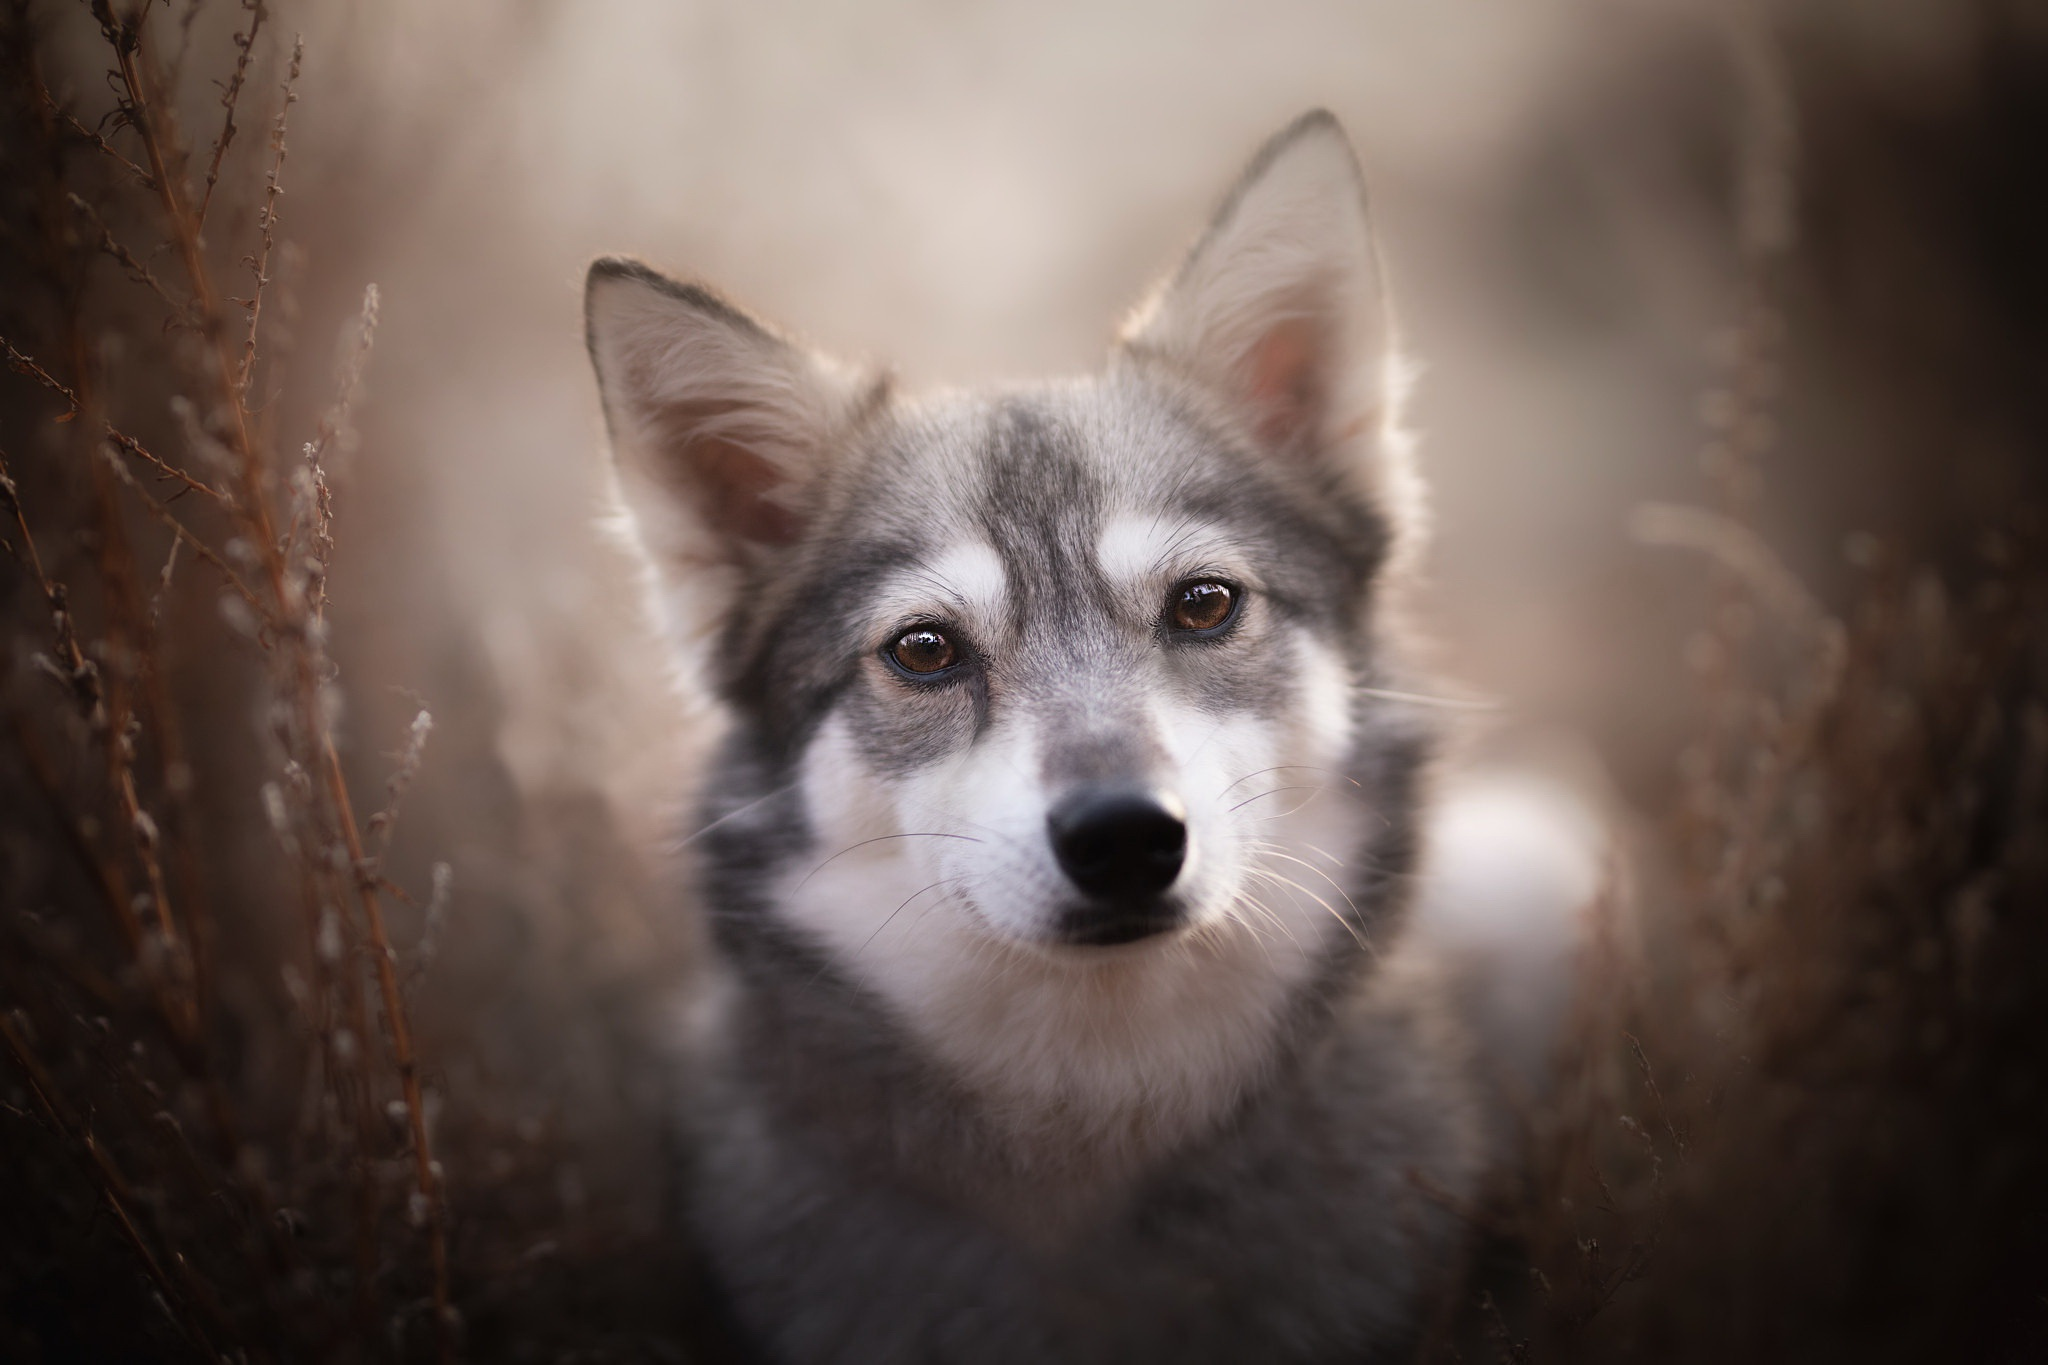 Dog Pet Puppy Baby Animal 2048x1365